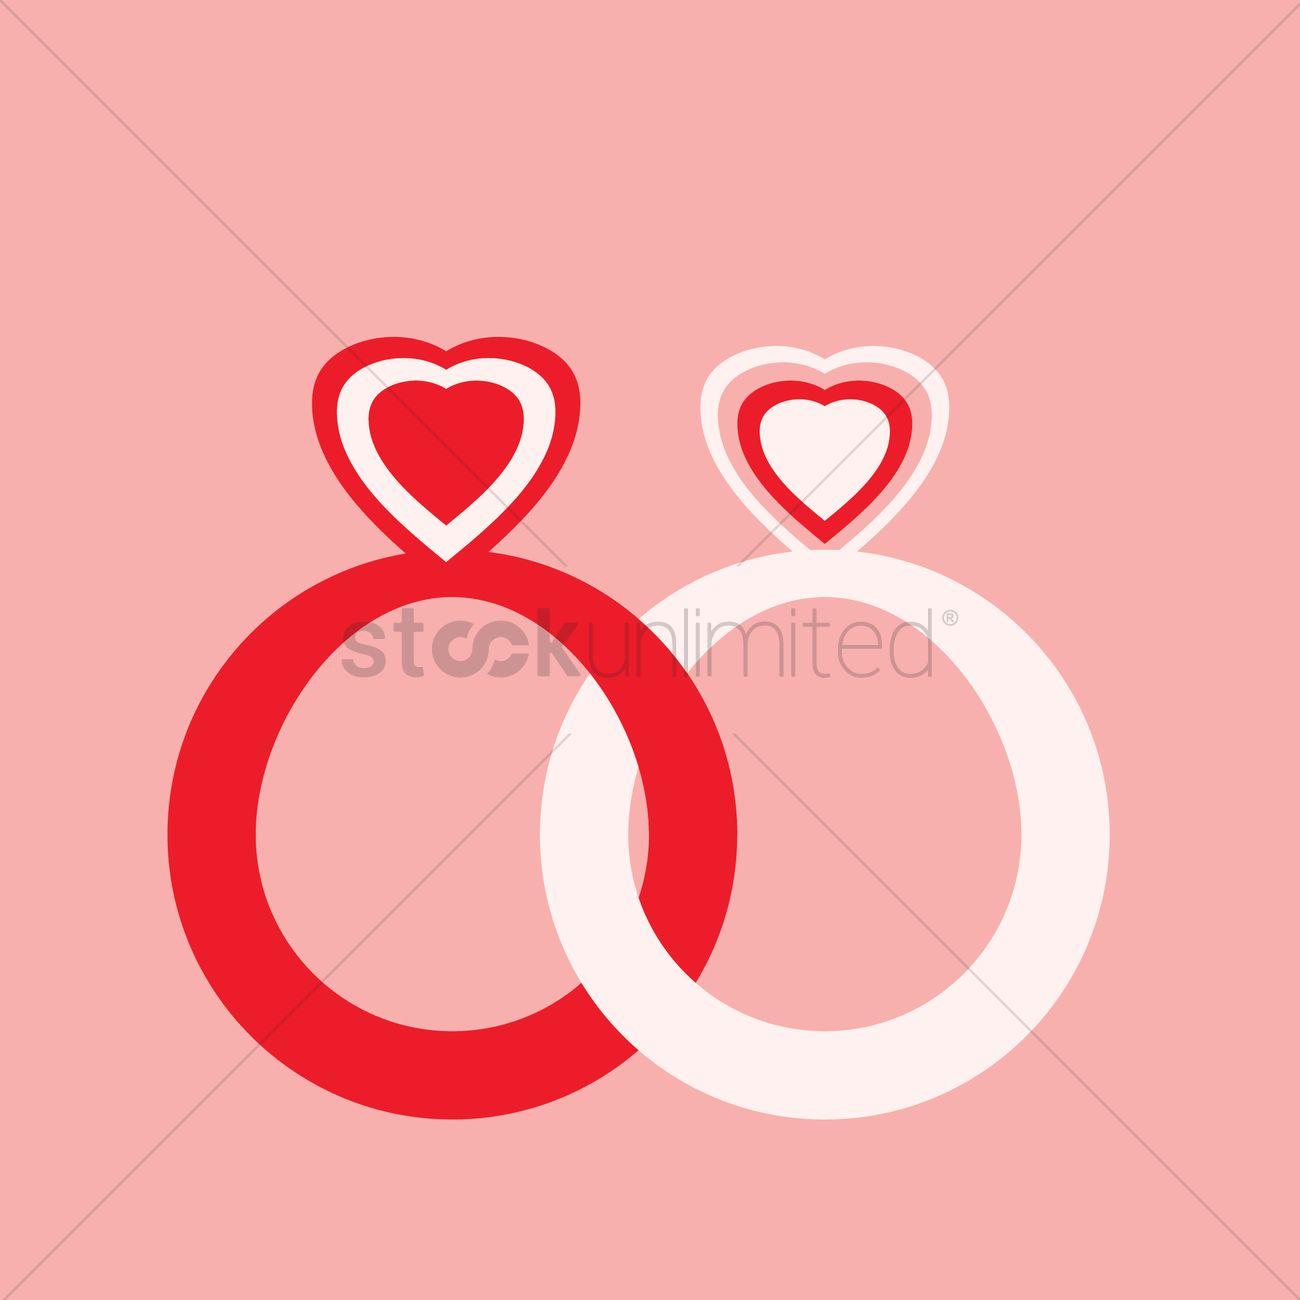 Wedding rings Vector Image - 1492883 | StockUnlimited